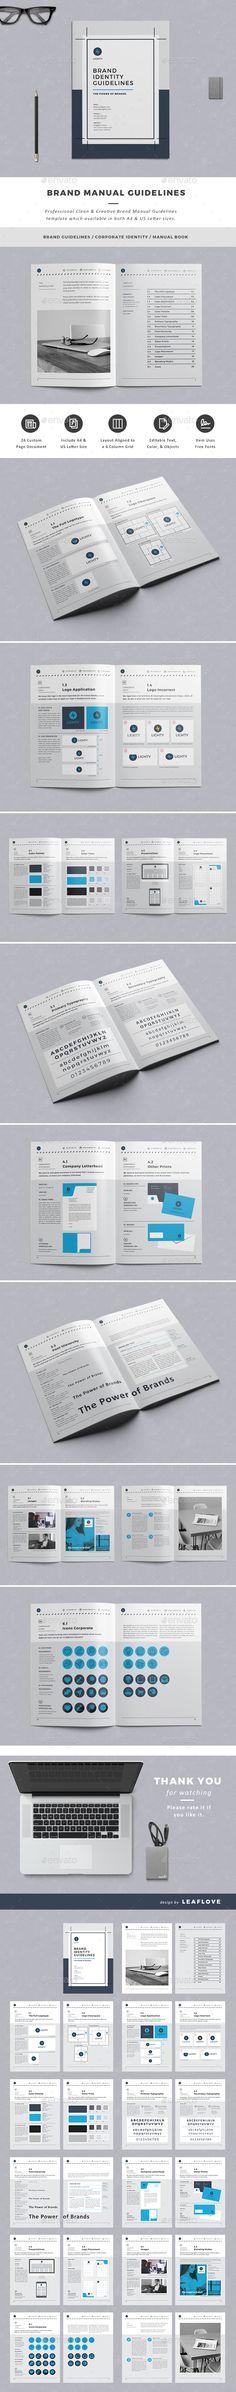 Brand Manual and Identity Template u2013 Corporate Design Brochure - operating manual template